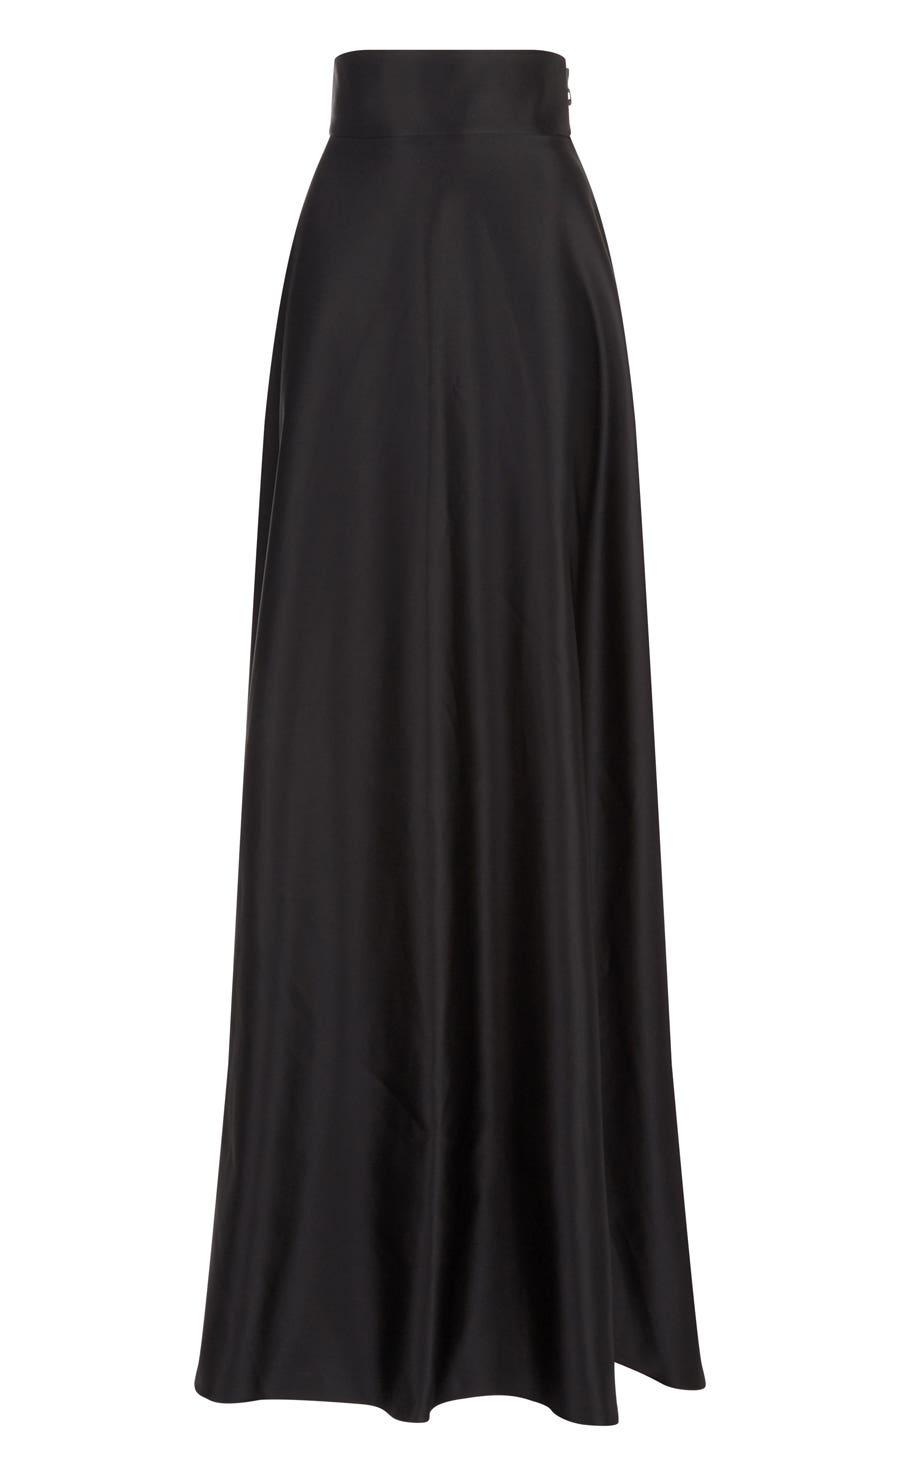 Waterlily Skirt, Black